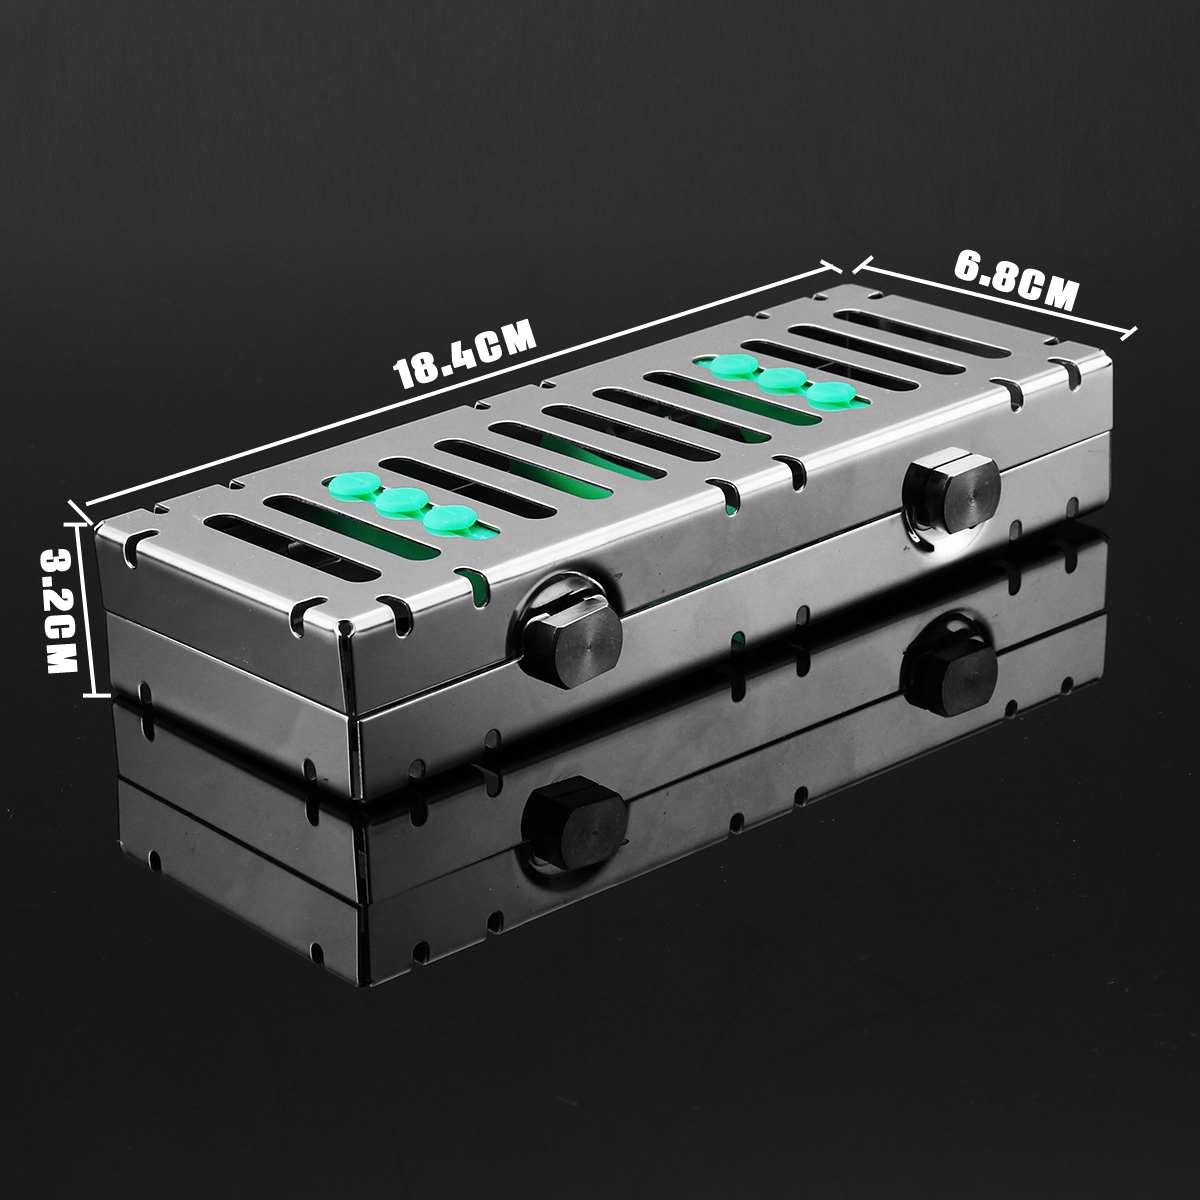 esterilizacao dental autoclave gaveta bandeja caixa rack 04